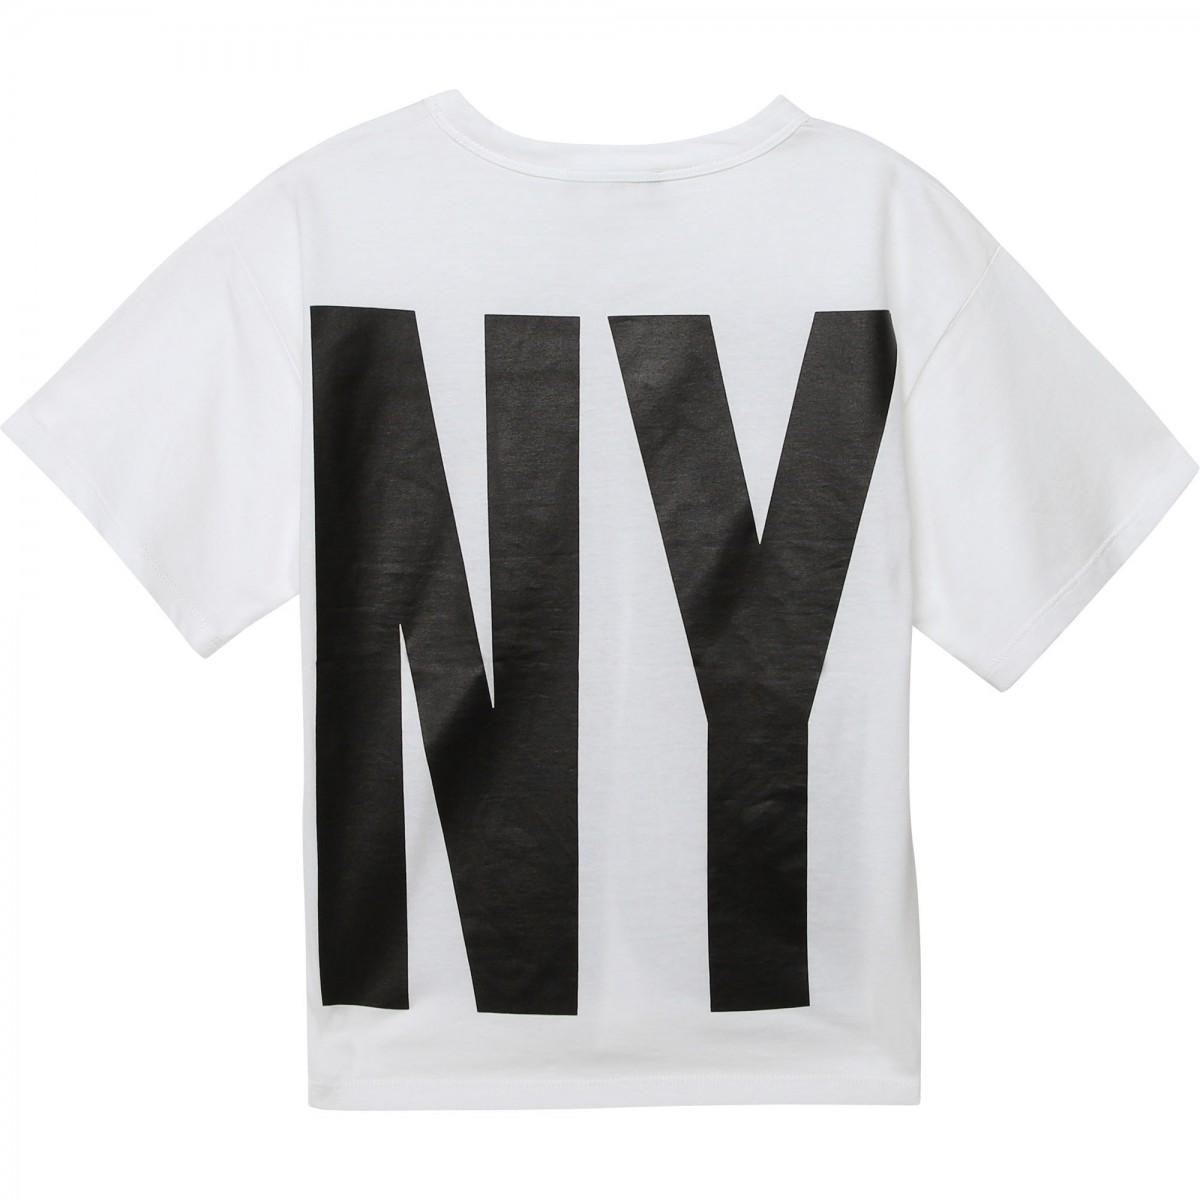 DKNY White&black logo T-shirt